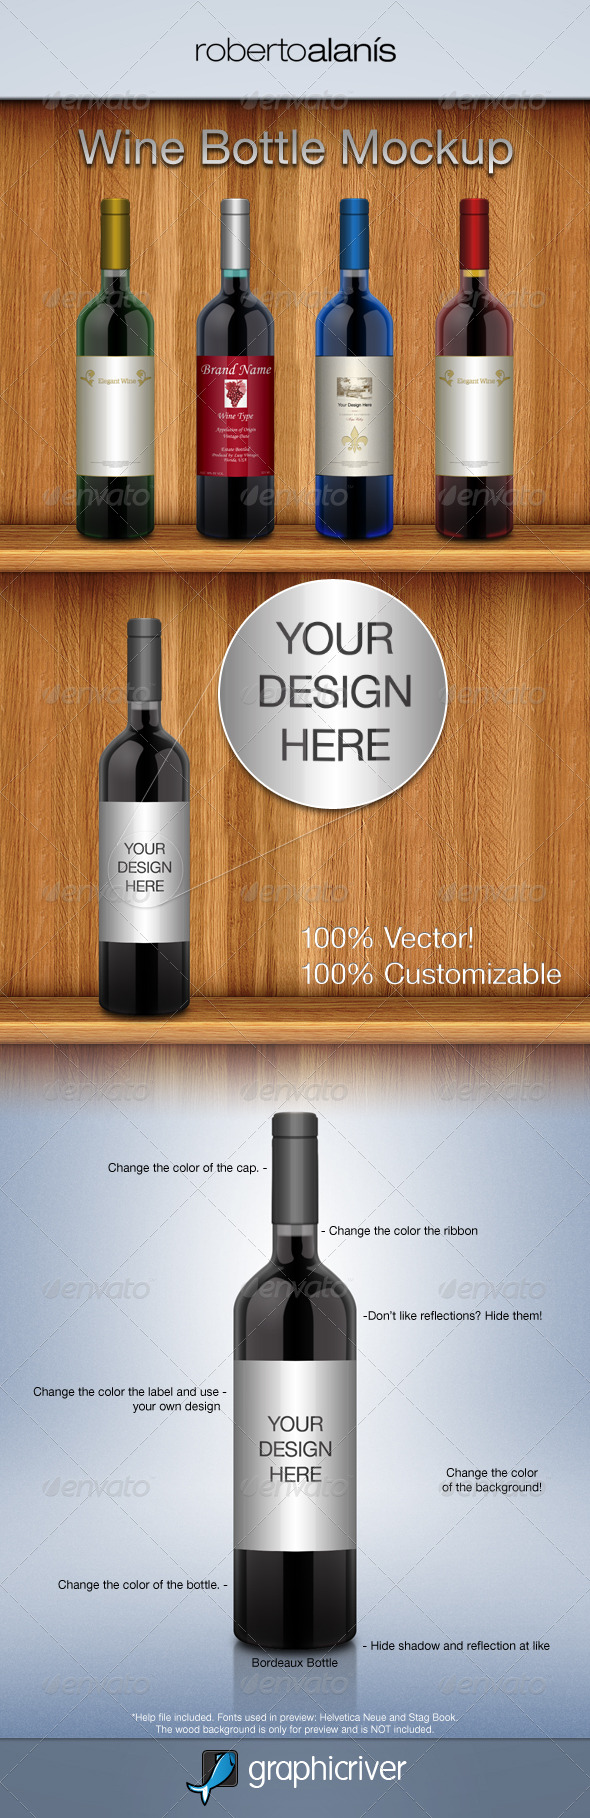 GraphicRiver Wine Bottle Mockup 160488